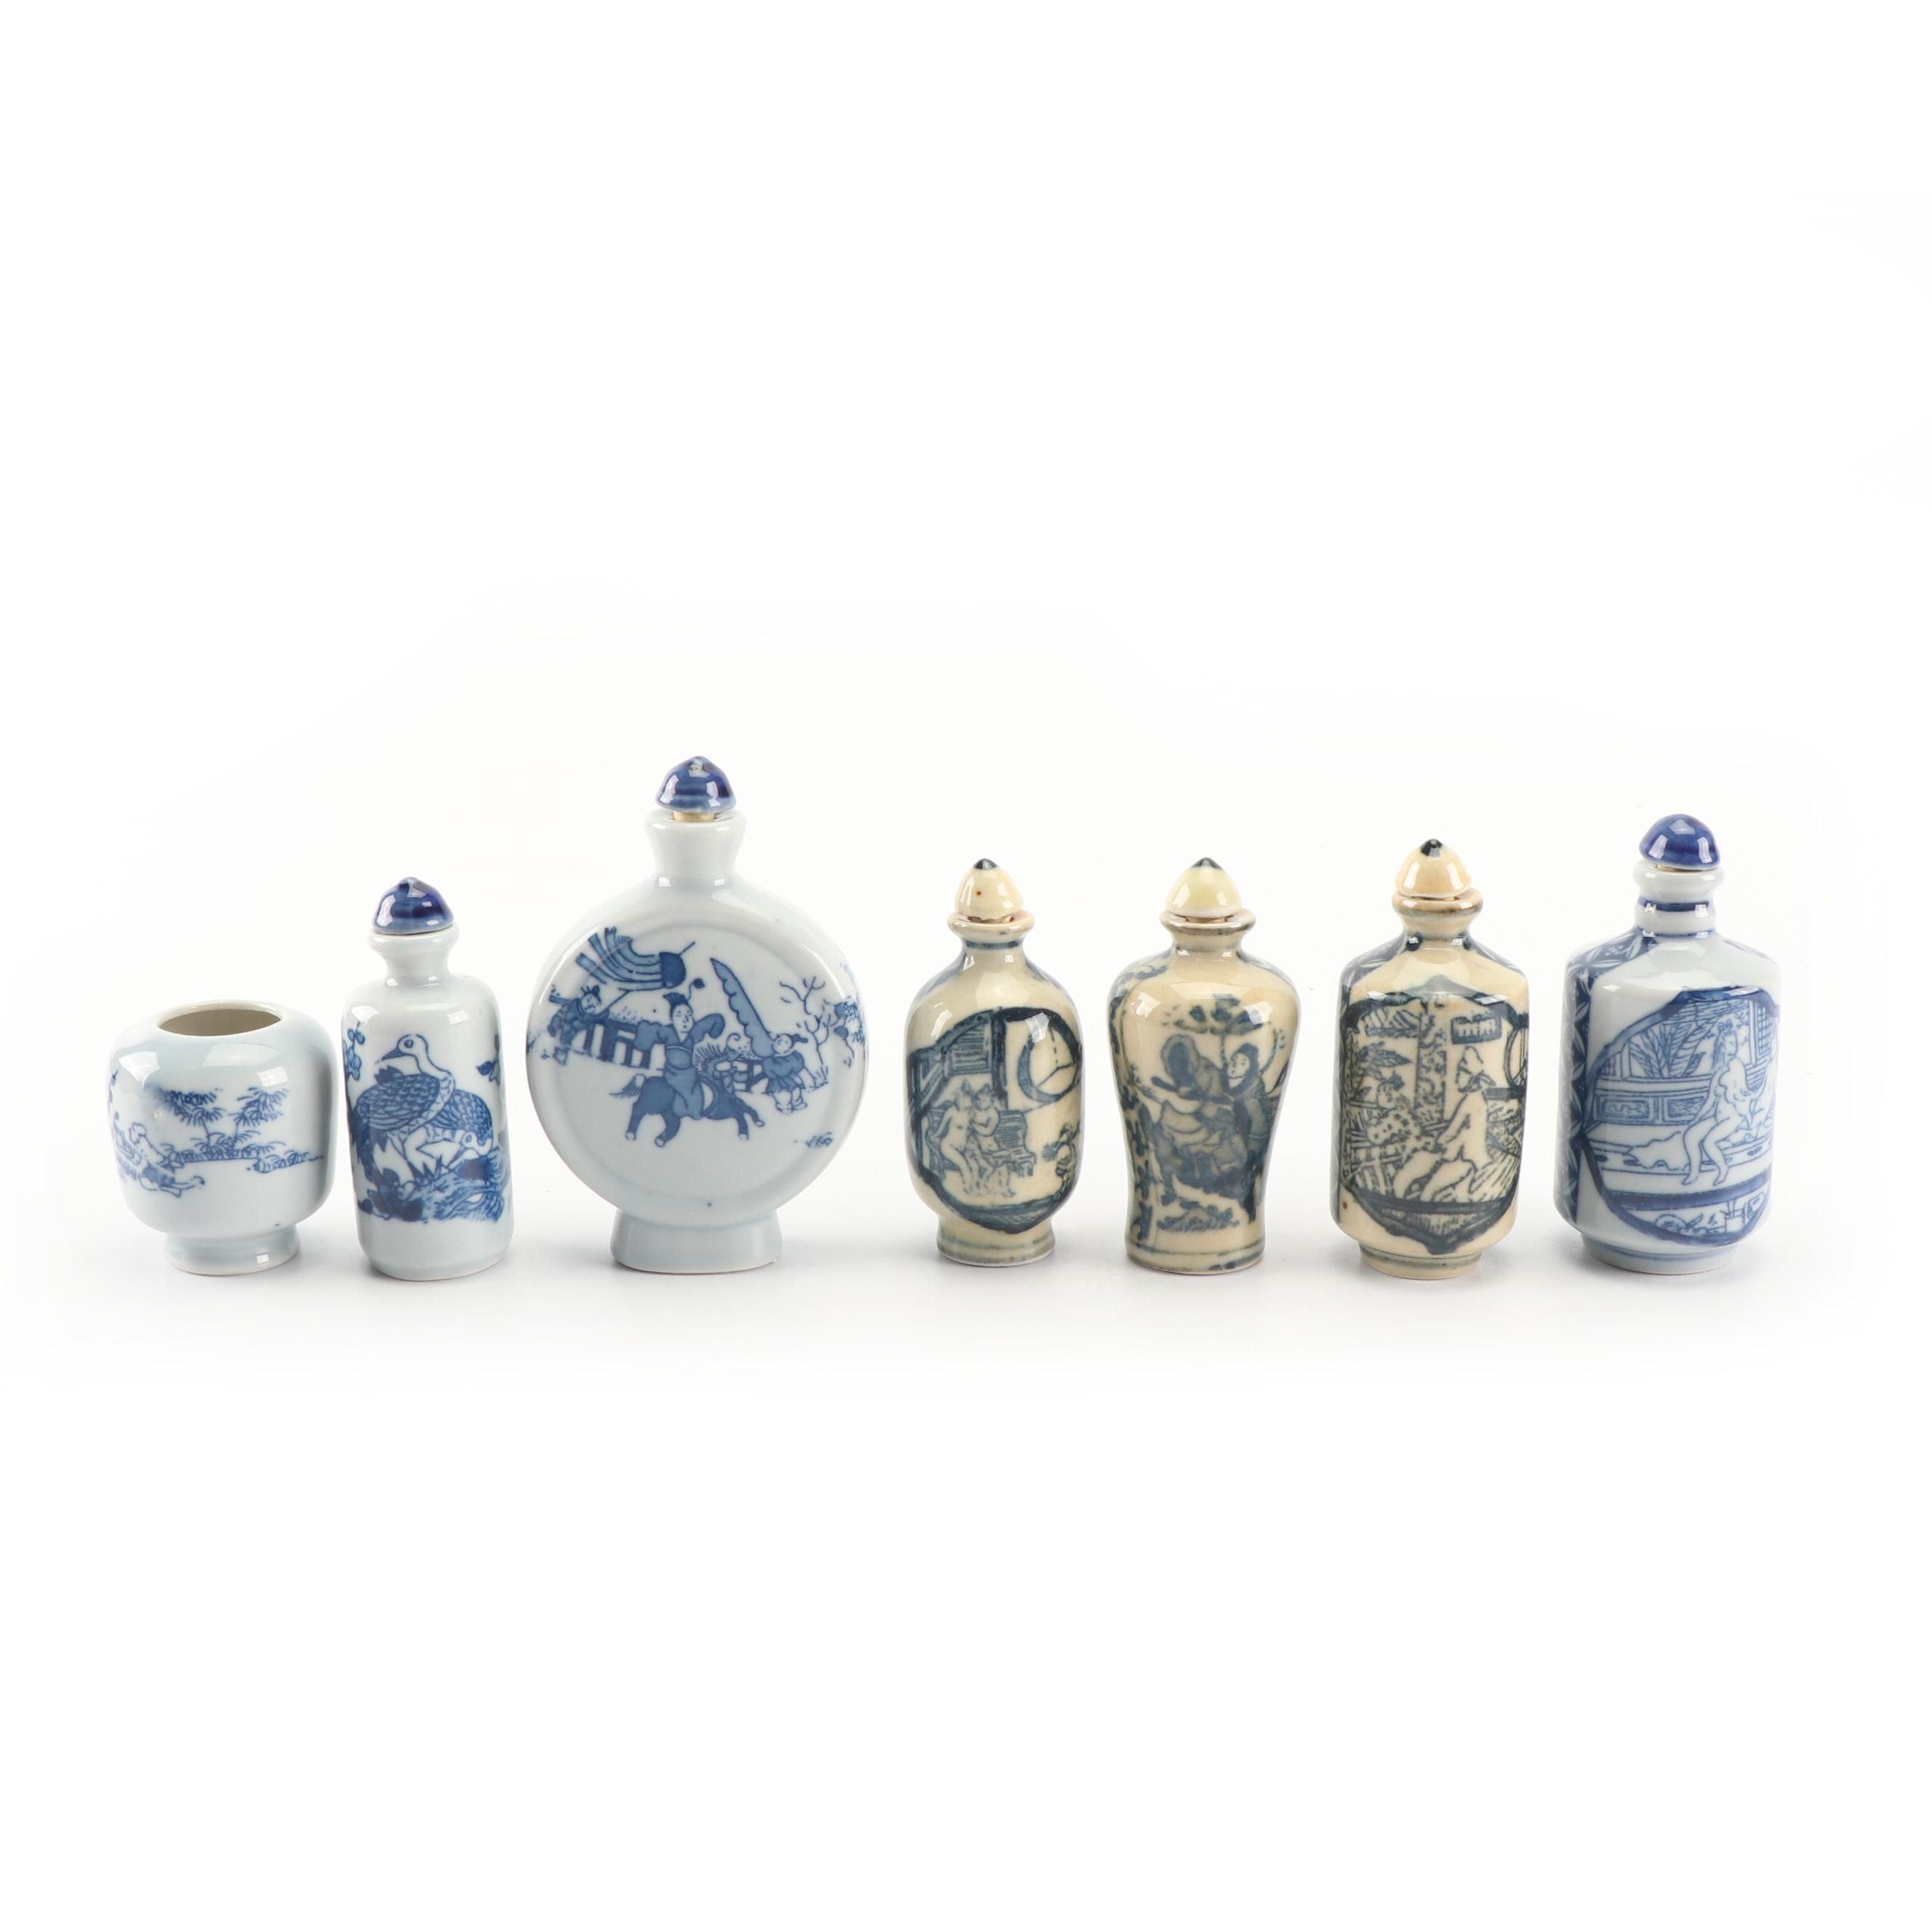 Chinese Ceramic Snuff Bottles